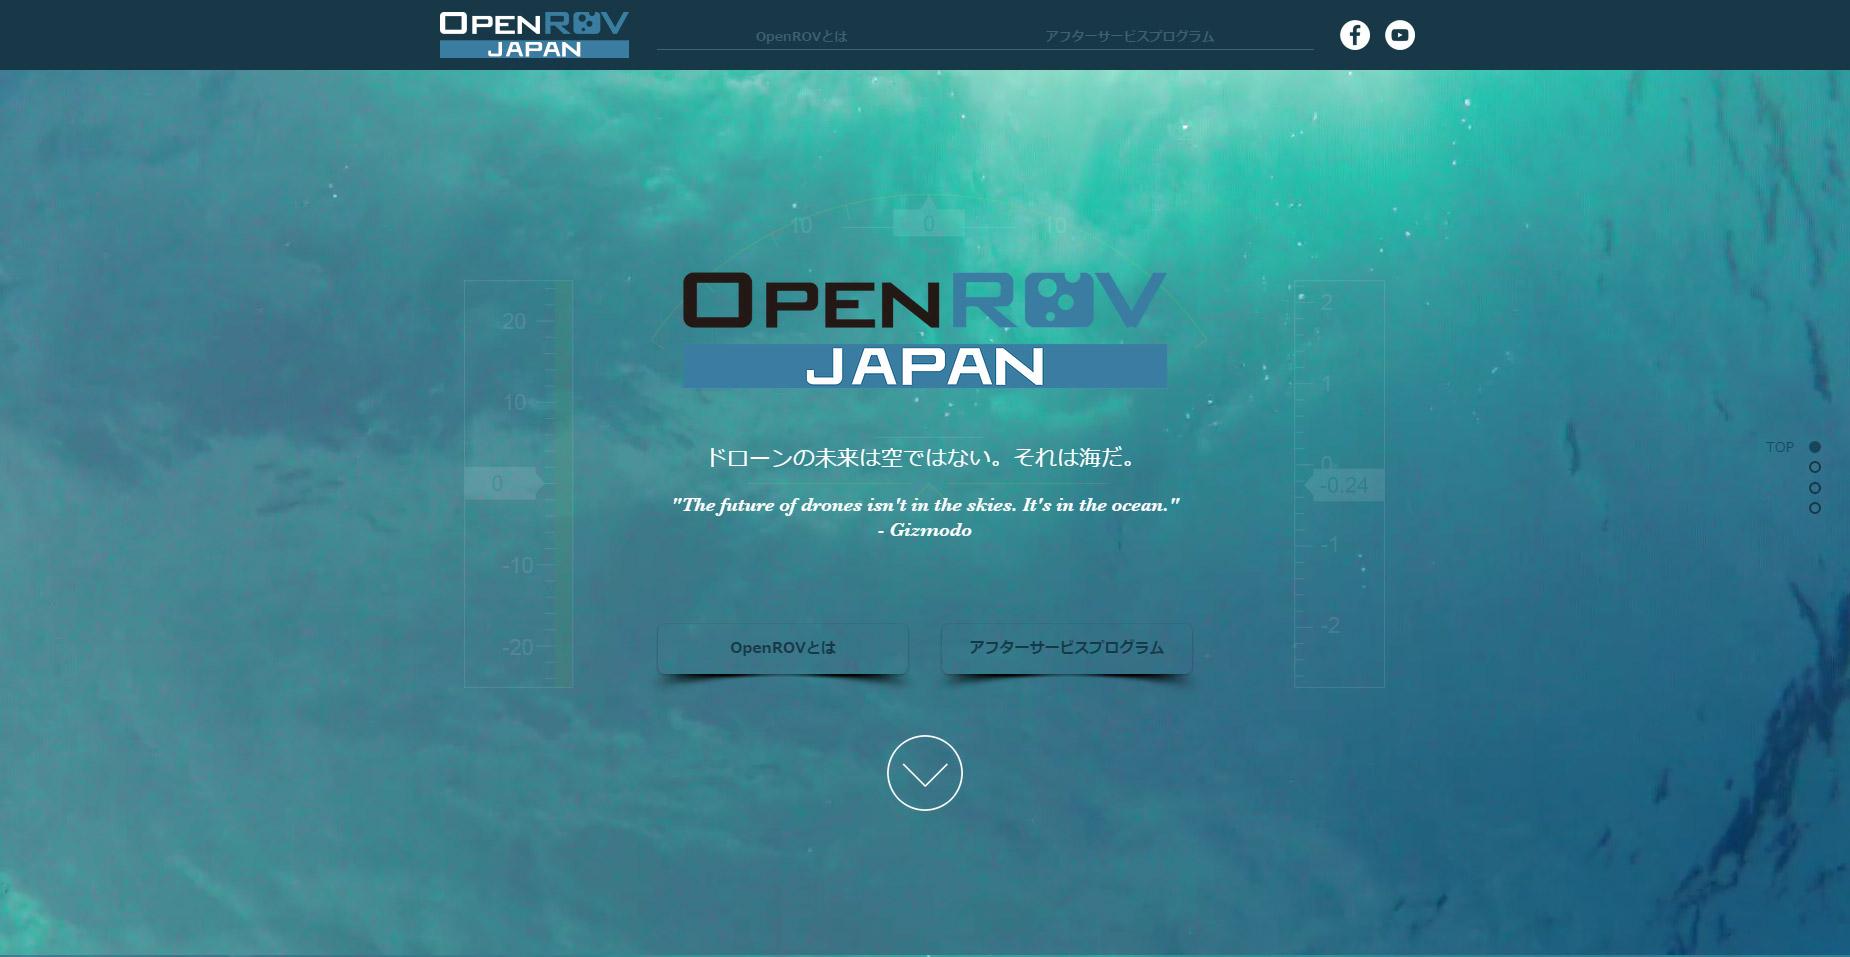 OpenROV Japan